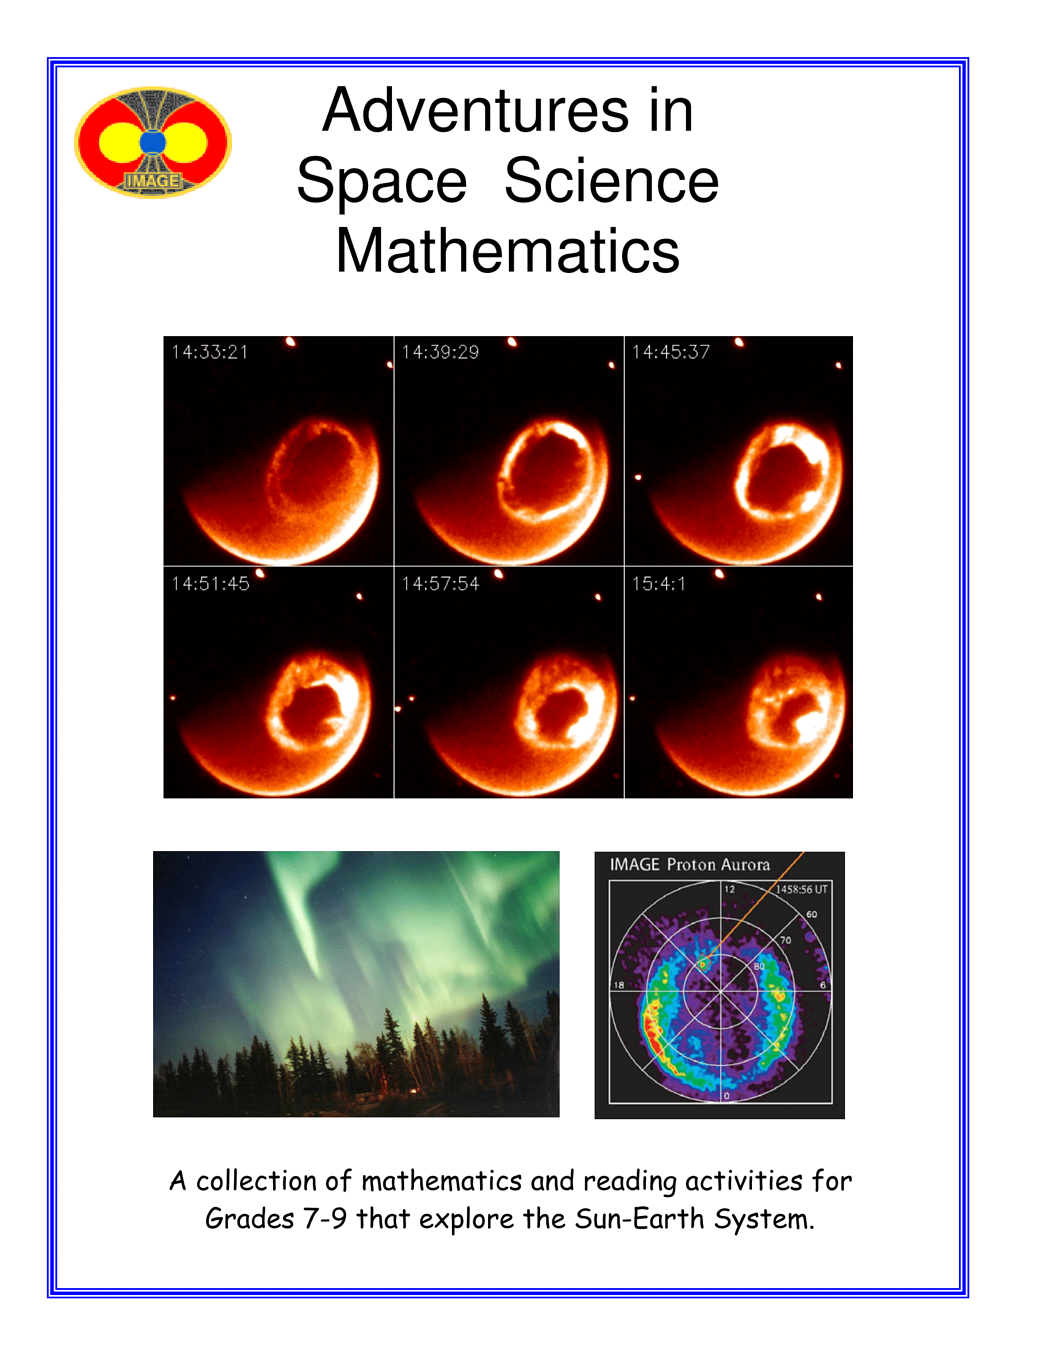 Adventures in Space Science Mathematics | NASA